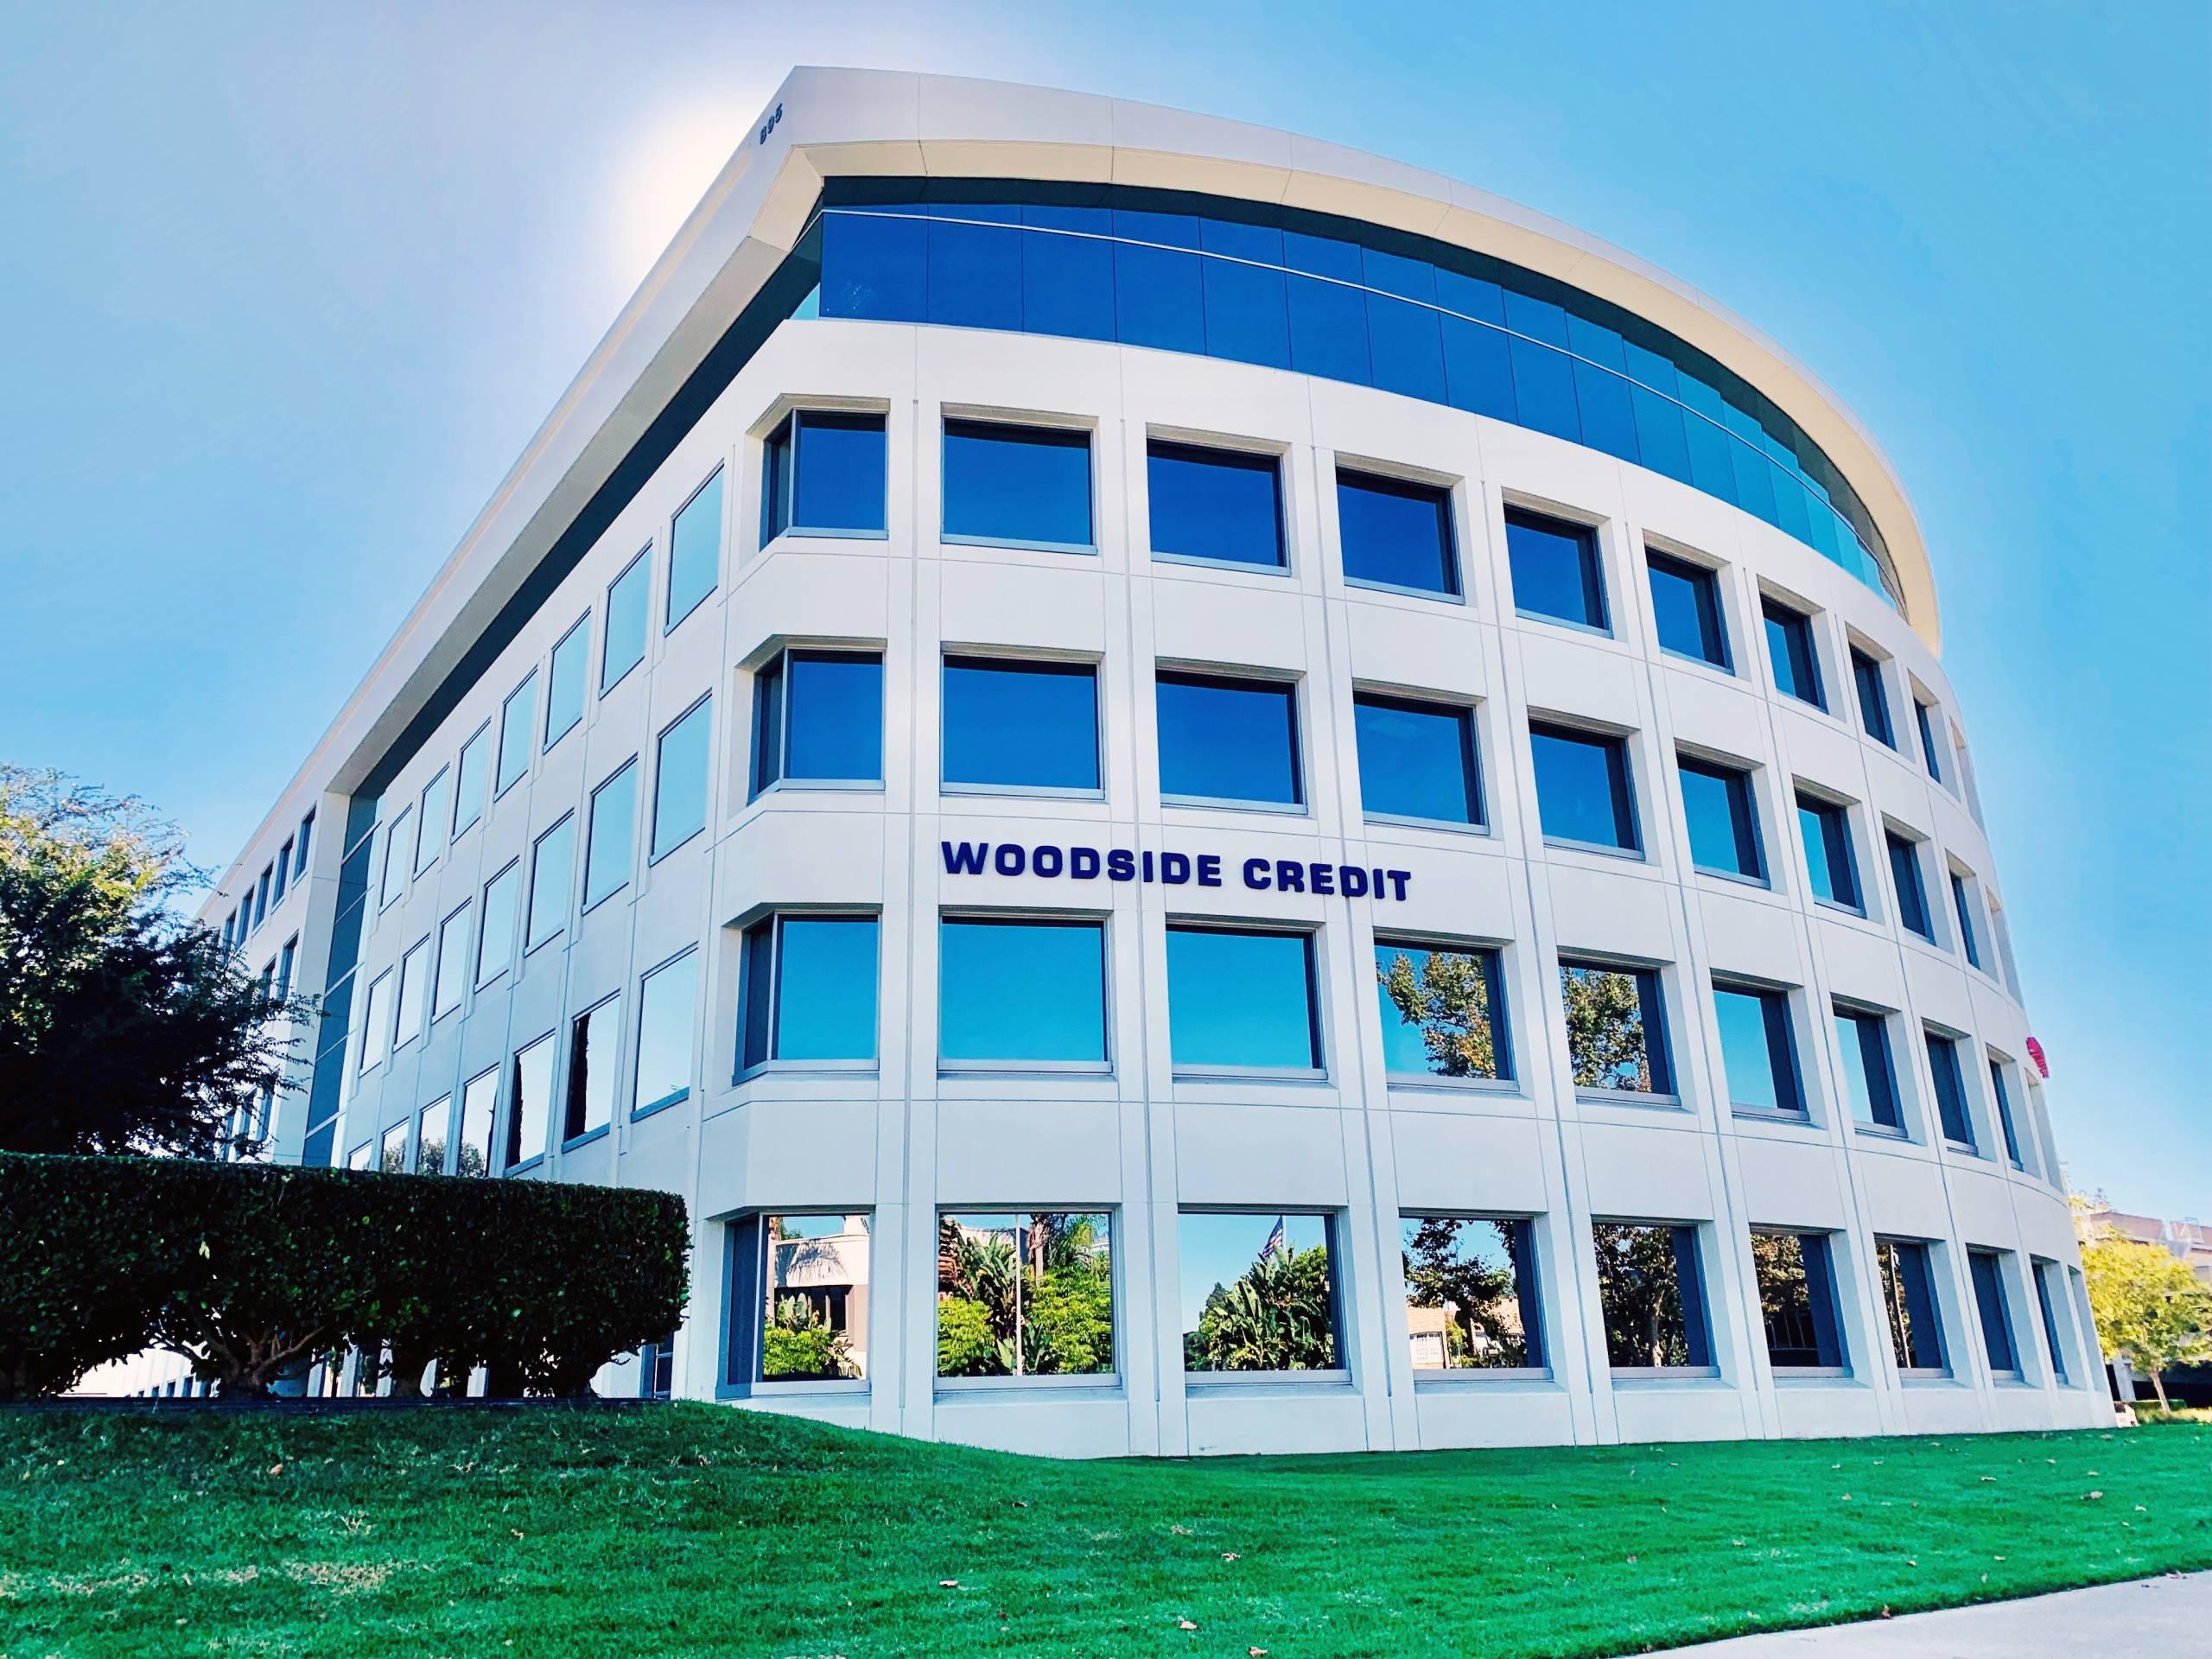 Woodside credit headquarters in newport beach california